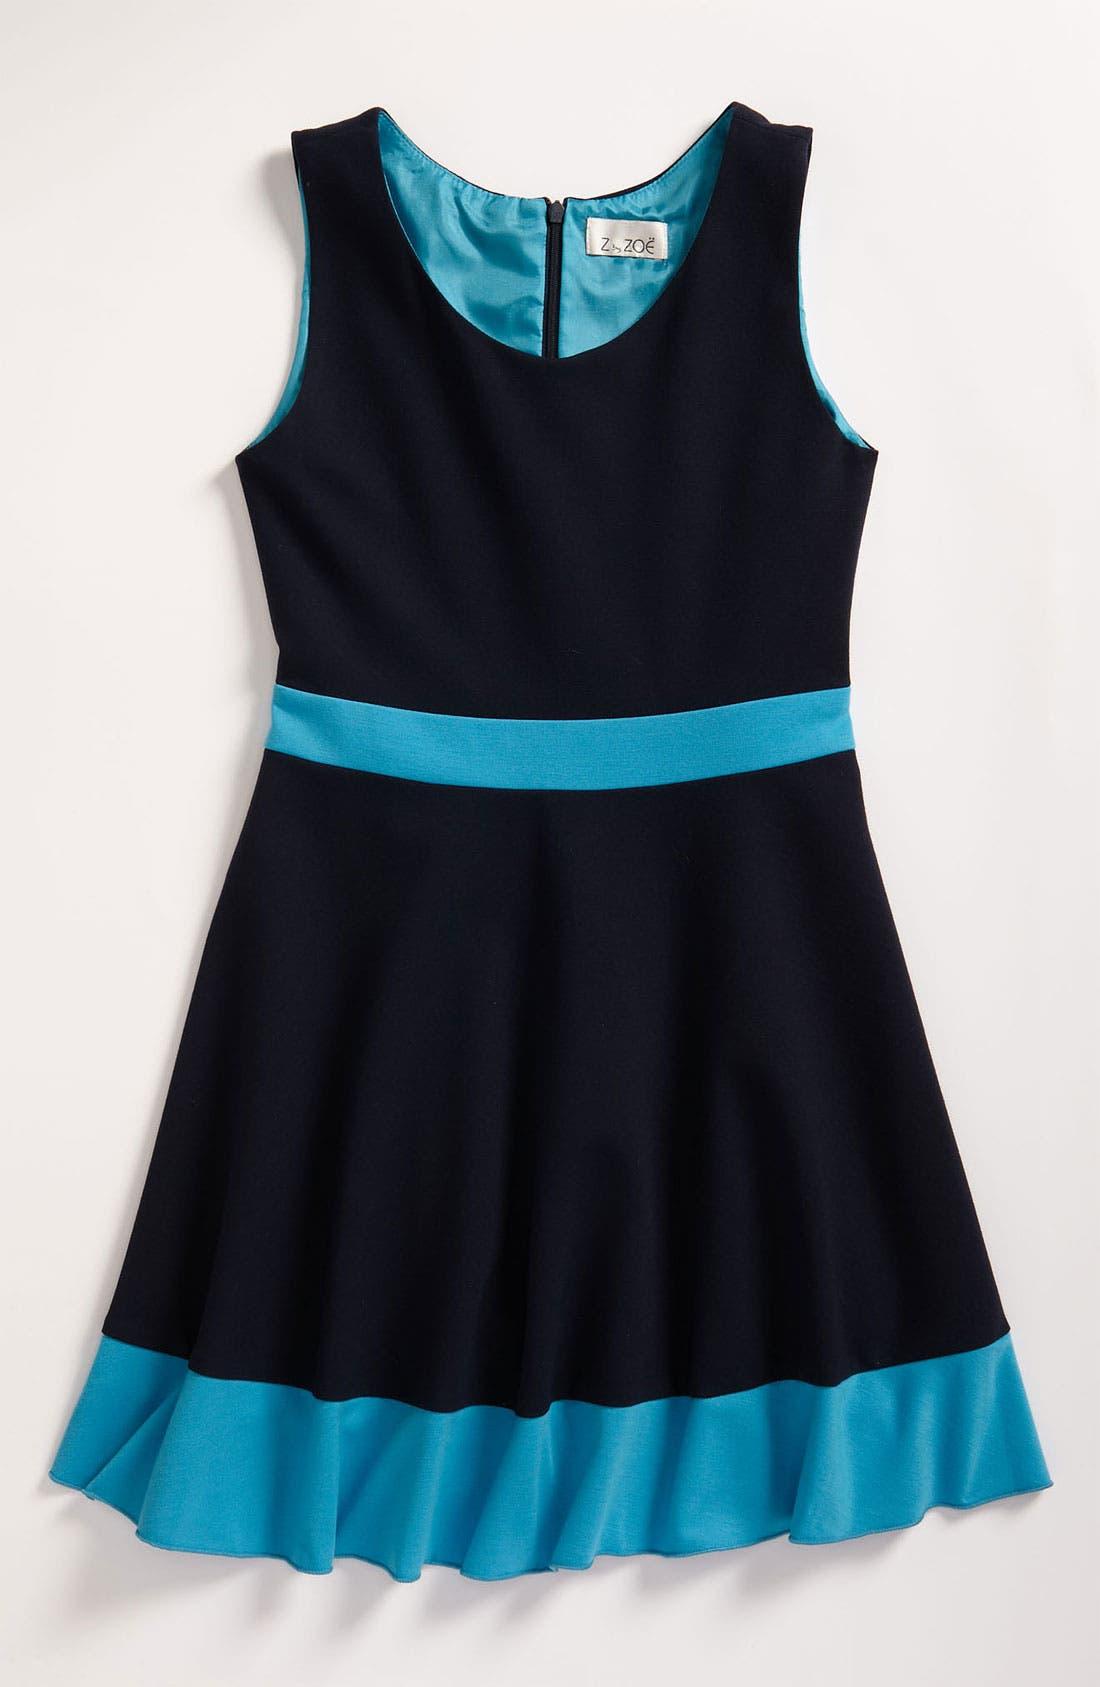 Alternate Image 1 Selected - Zoe Ltd Colorblock Tank Dress (Big Girls)